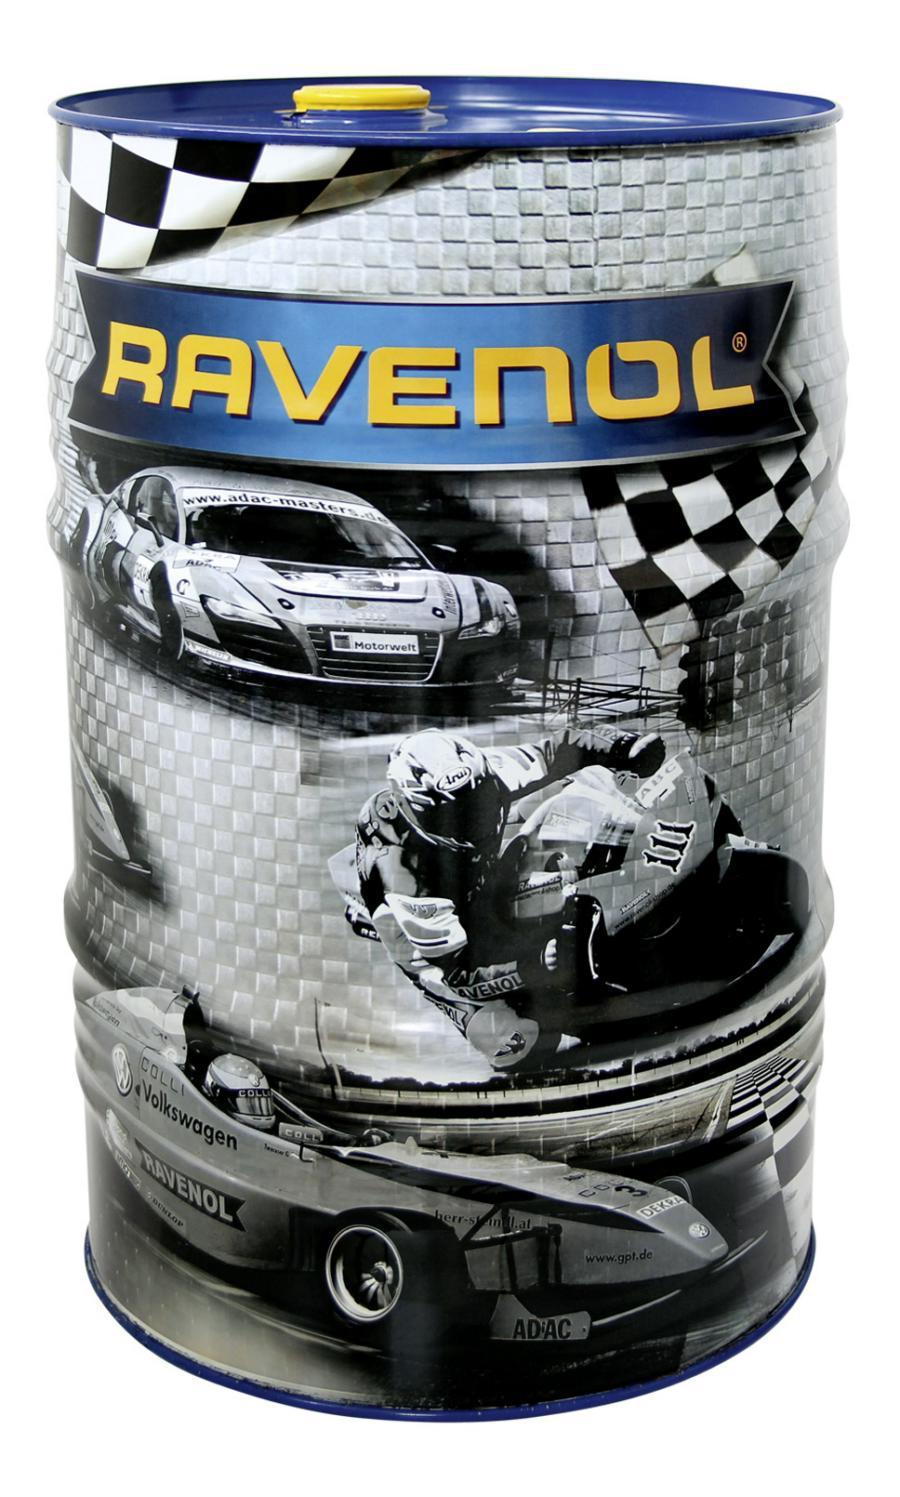 Ravenol Turbo Plus SHPD 10W-30 .